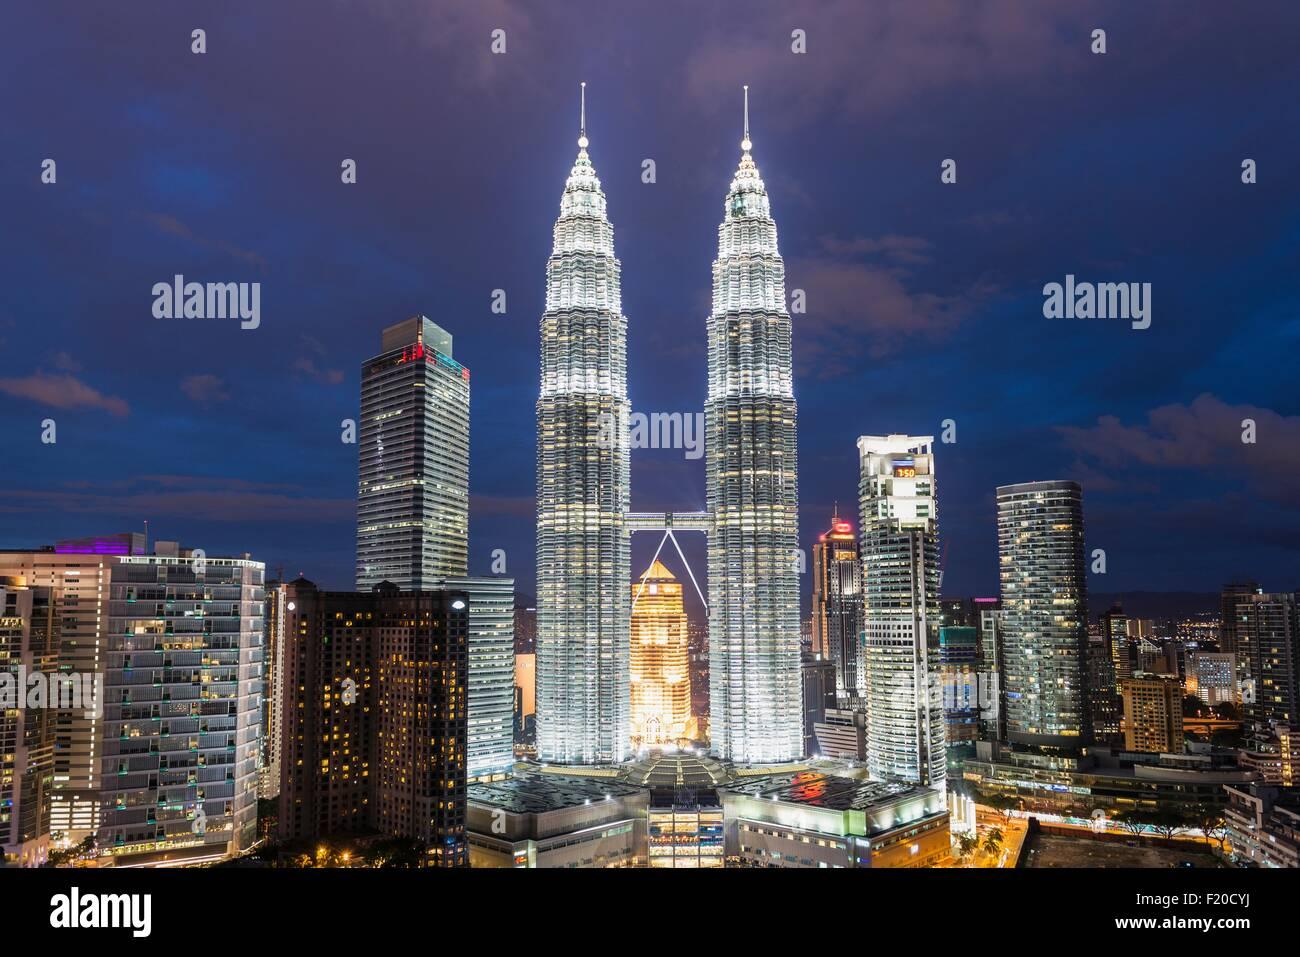 Torres Petronas iluminadas en la noche, Kuala Lumpur, Malasia Imagen De Stock